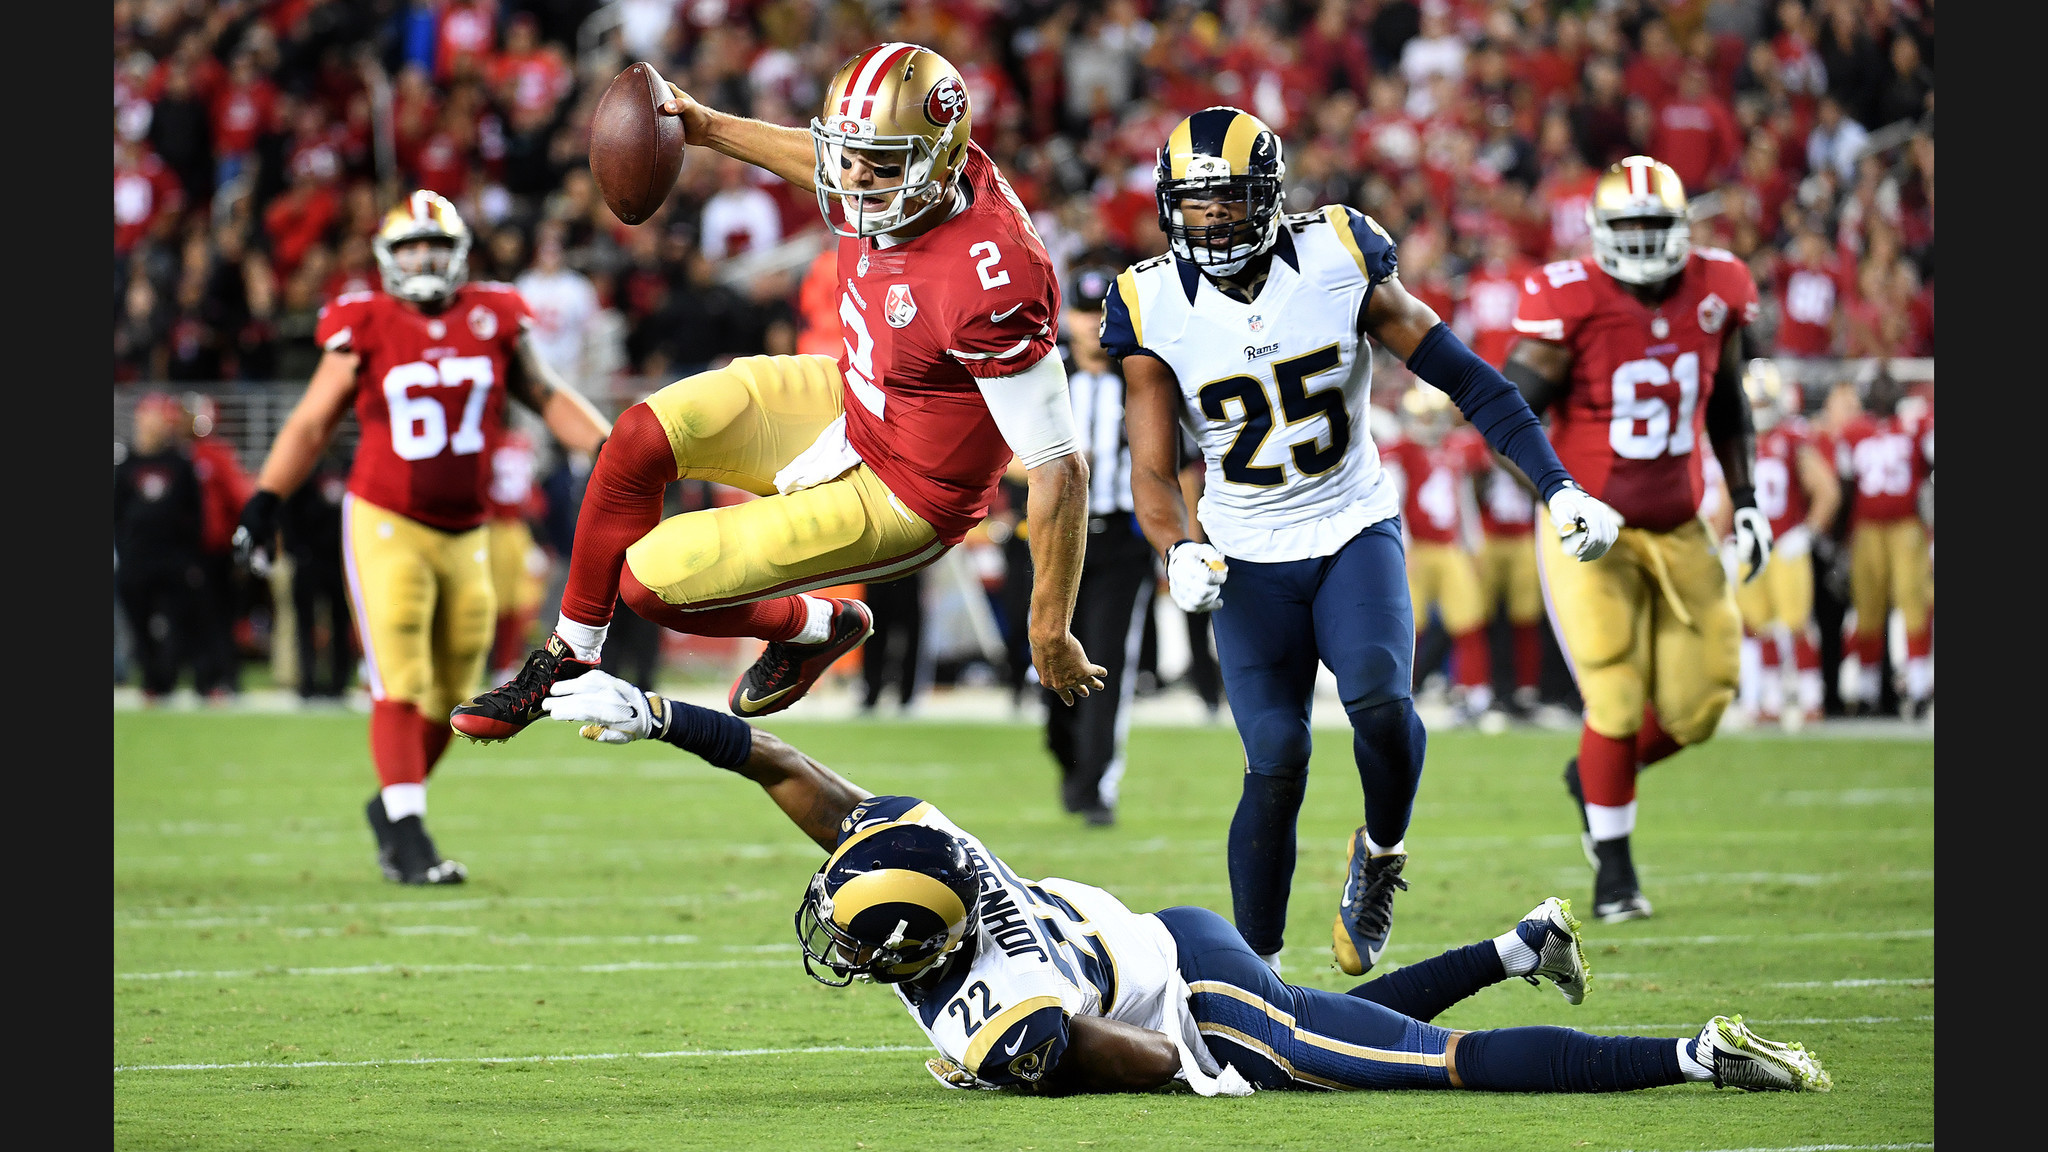 49ers quarterback Blaine Gabbert leaps for a 1st down over Rams cornerback  Trumaine Johnson in the